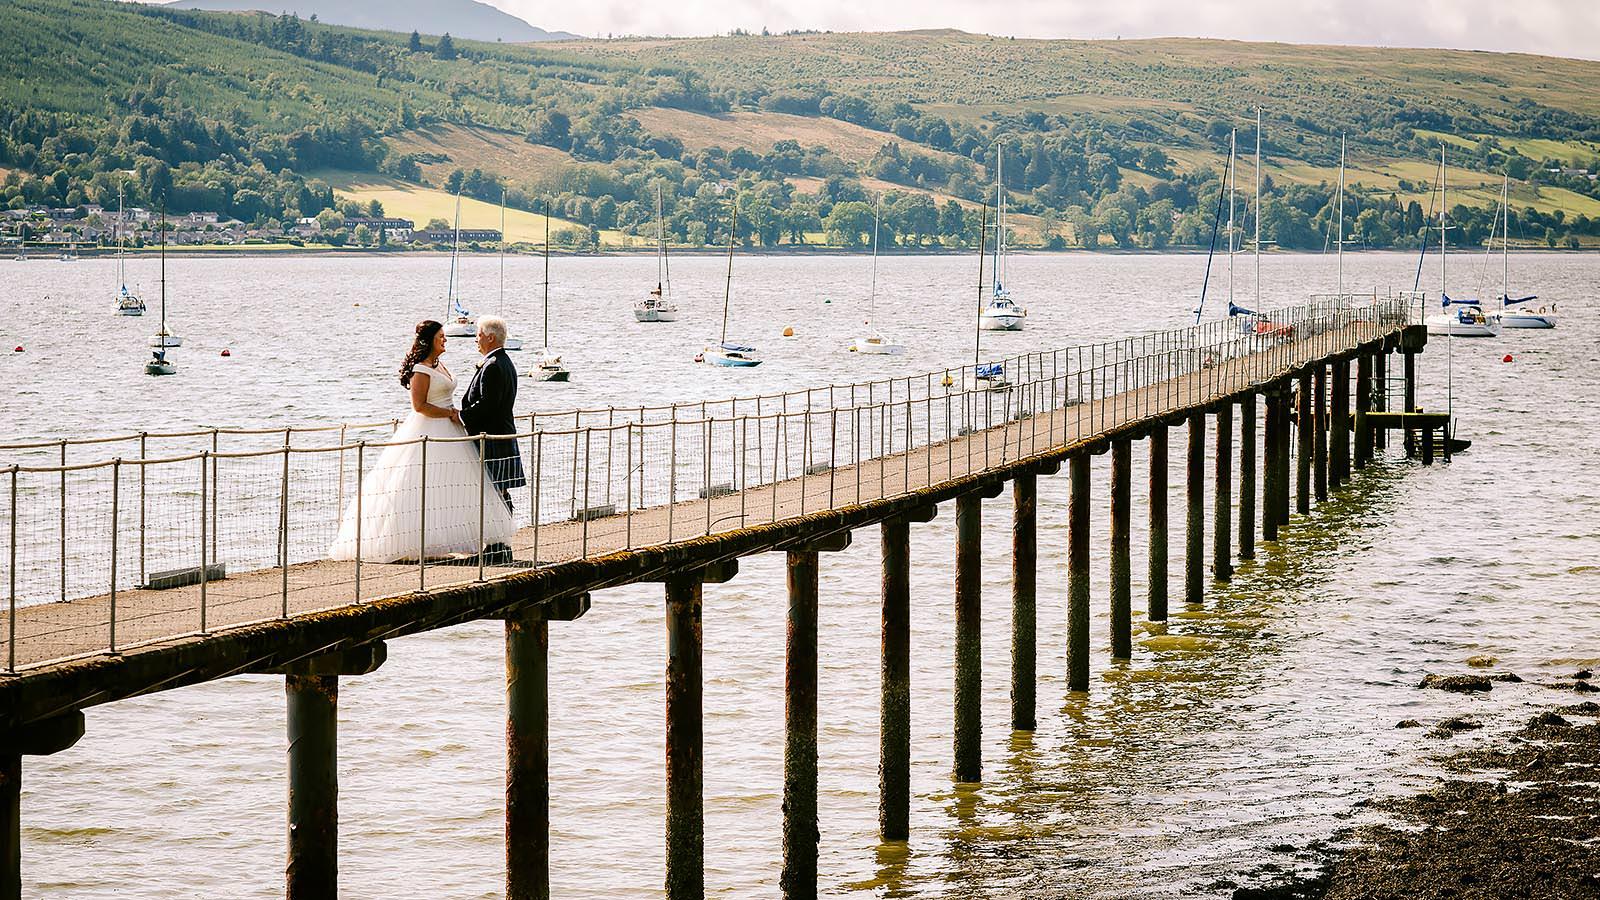 Wedding Photography by Ian Arthur in Argyll, Loch Lomond, Glasgow and across Scotland